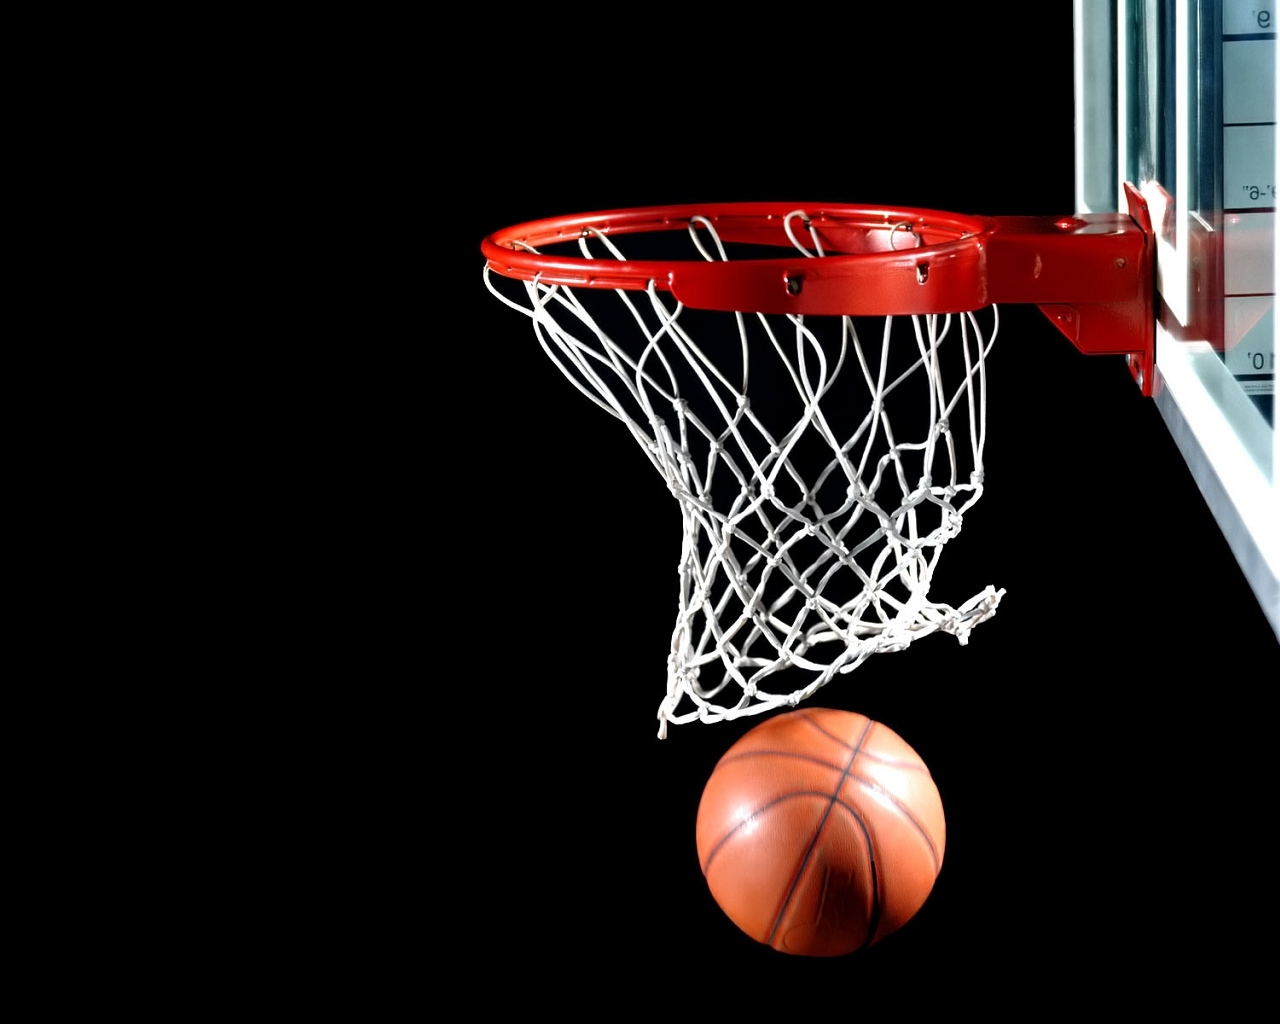 Image result for صور لرياضة كرة السلة للأطفال